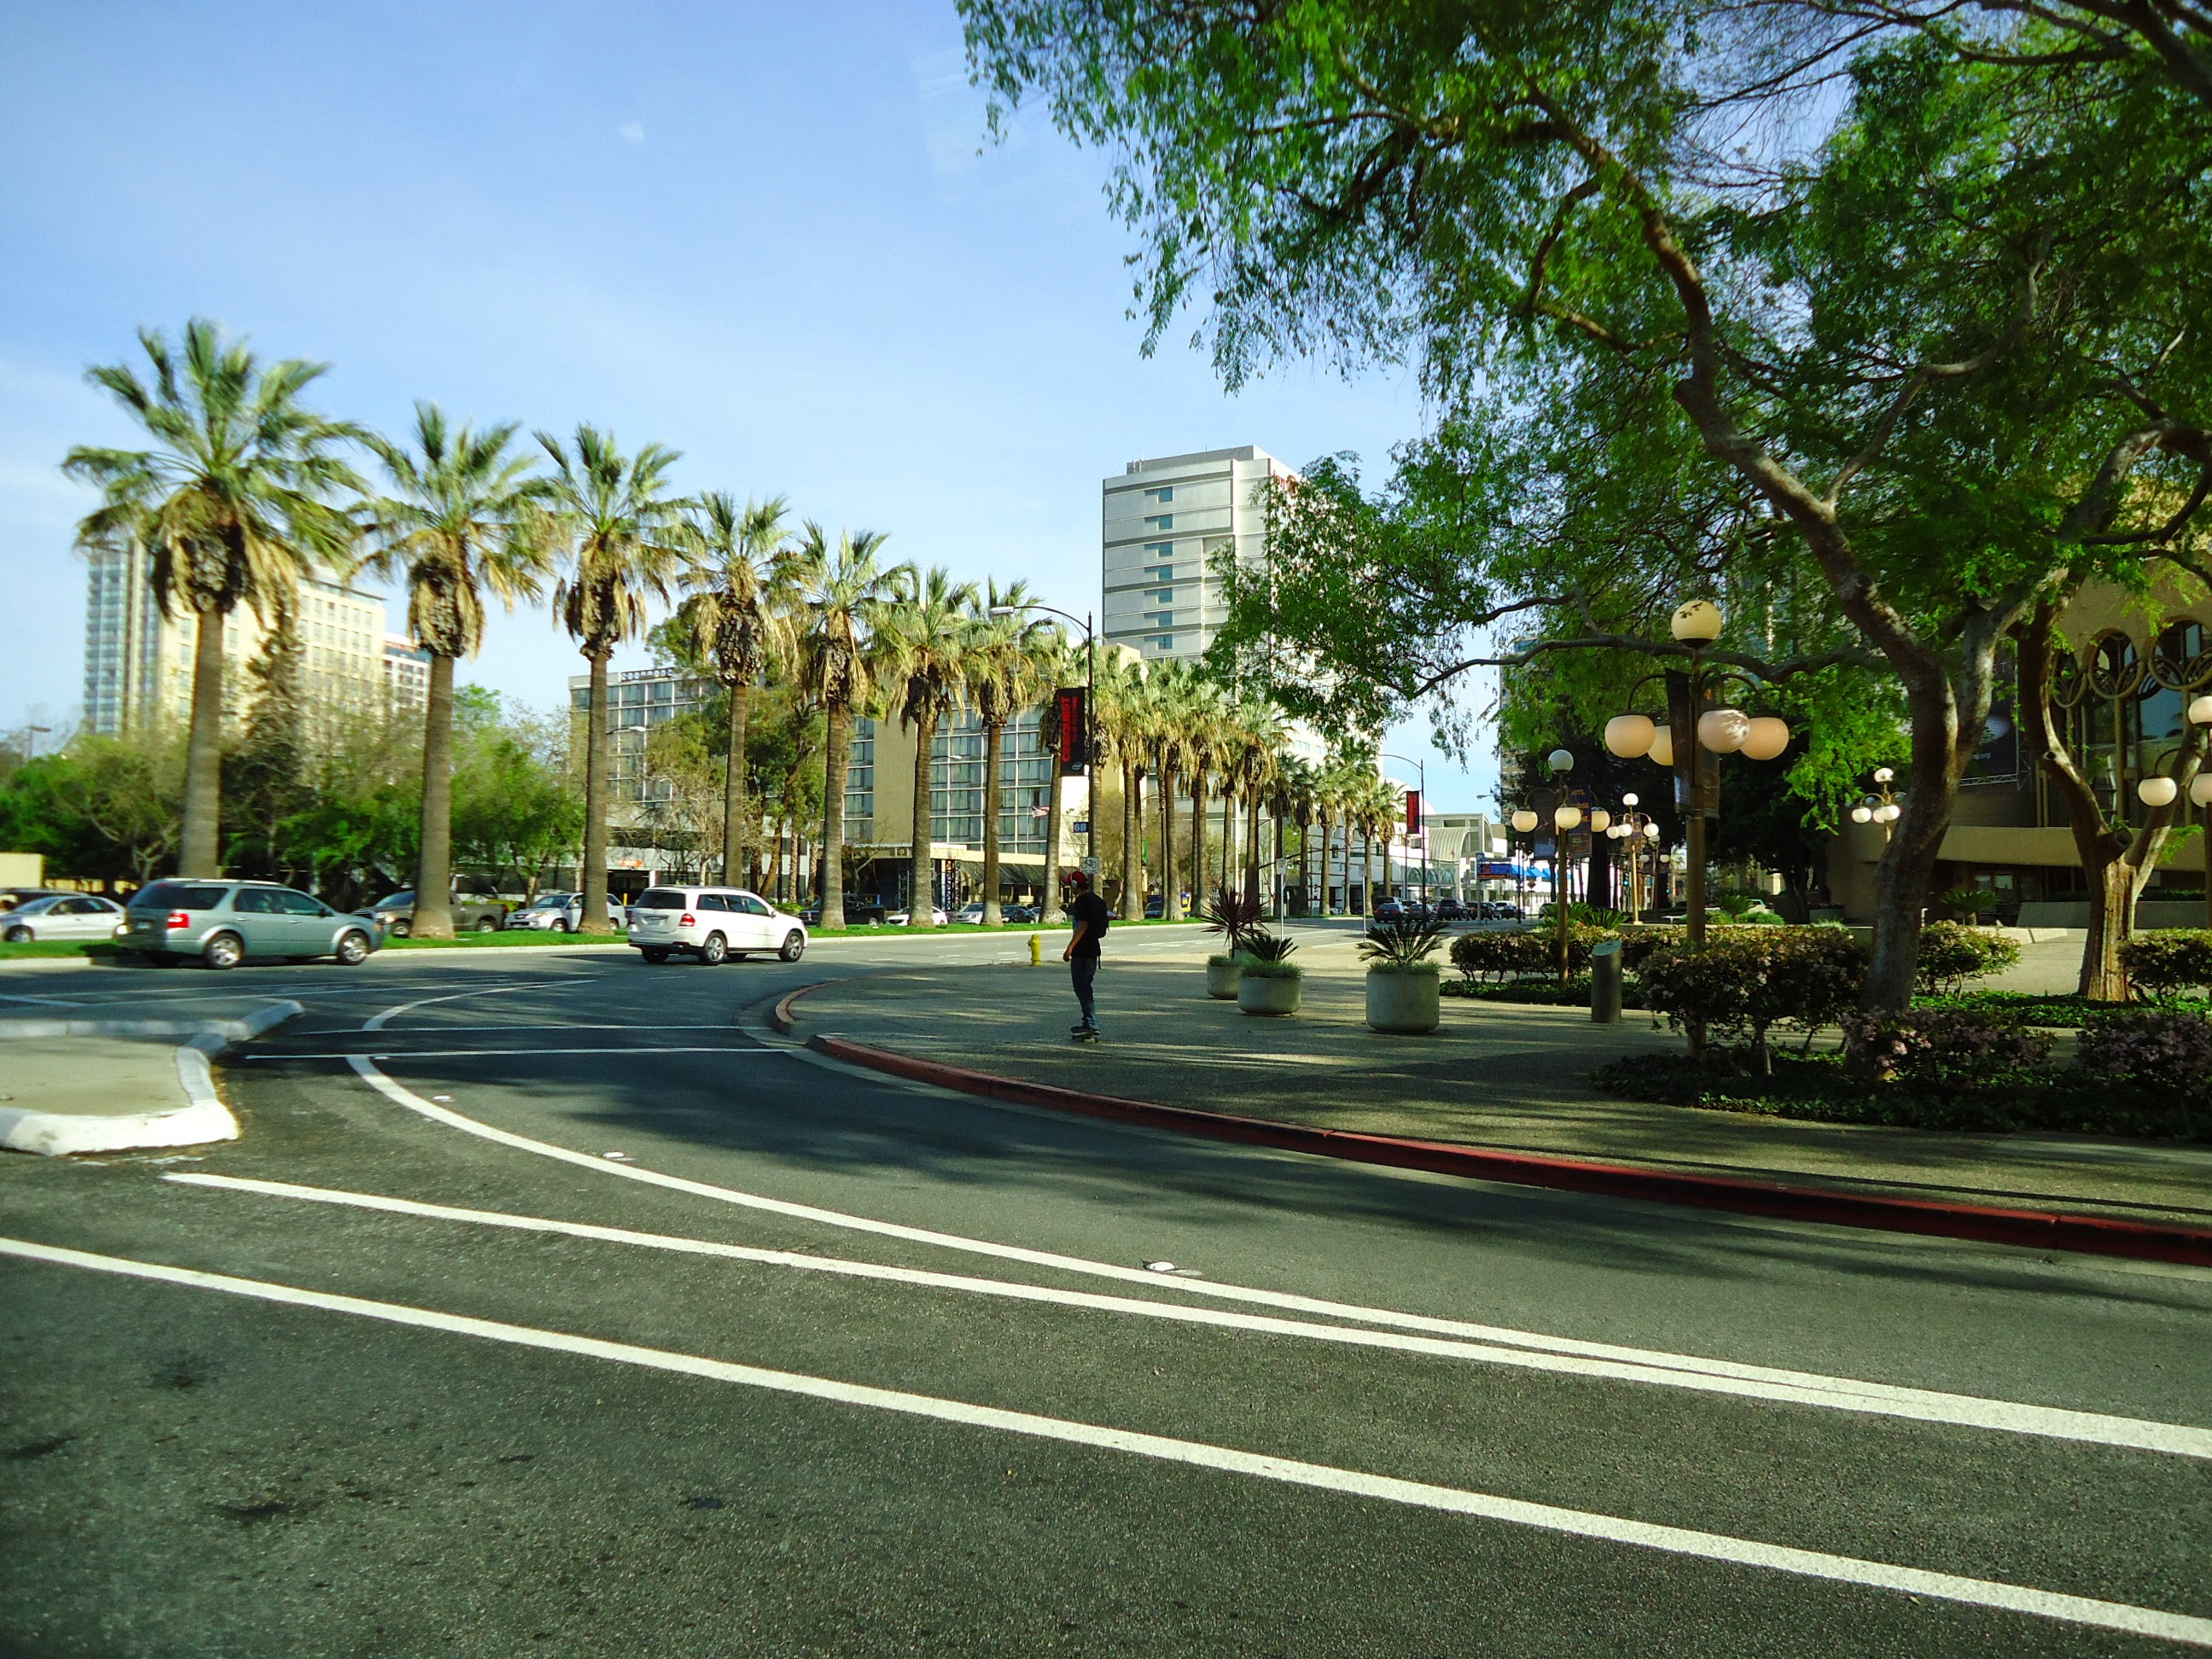 San Jose Commercial Property Management Companies